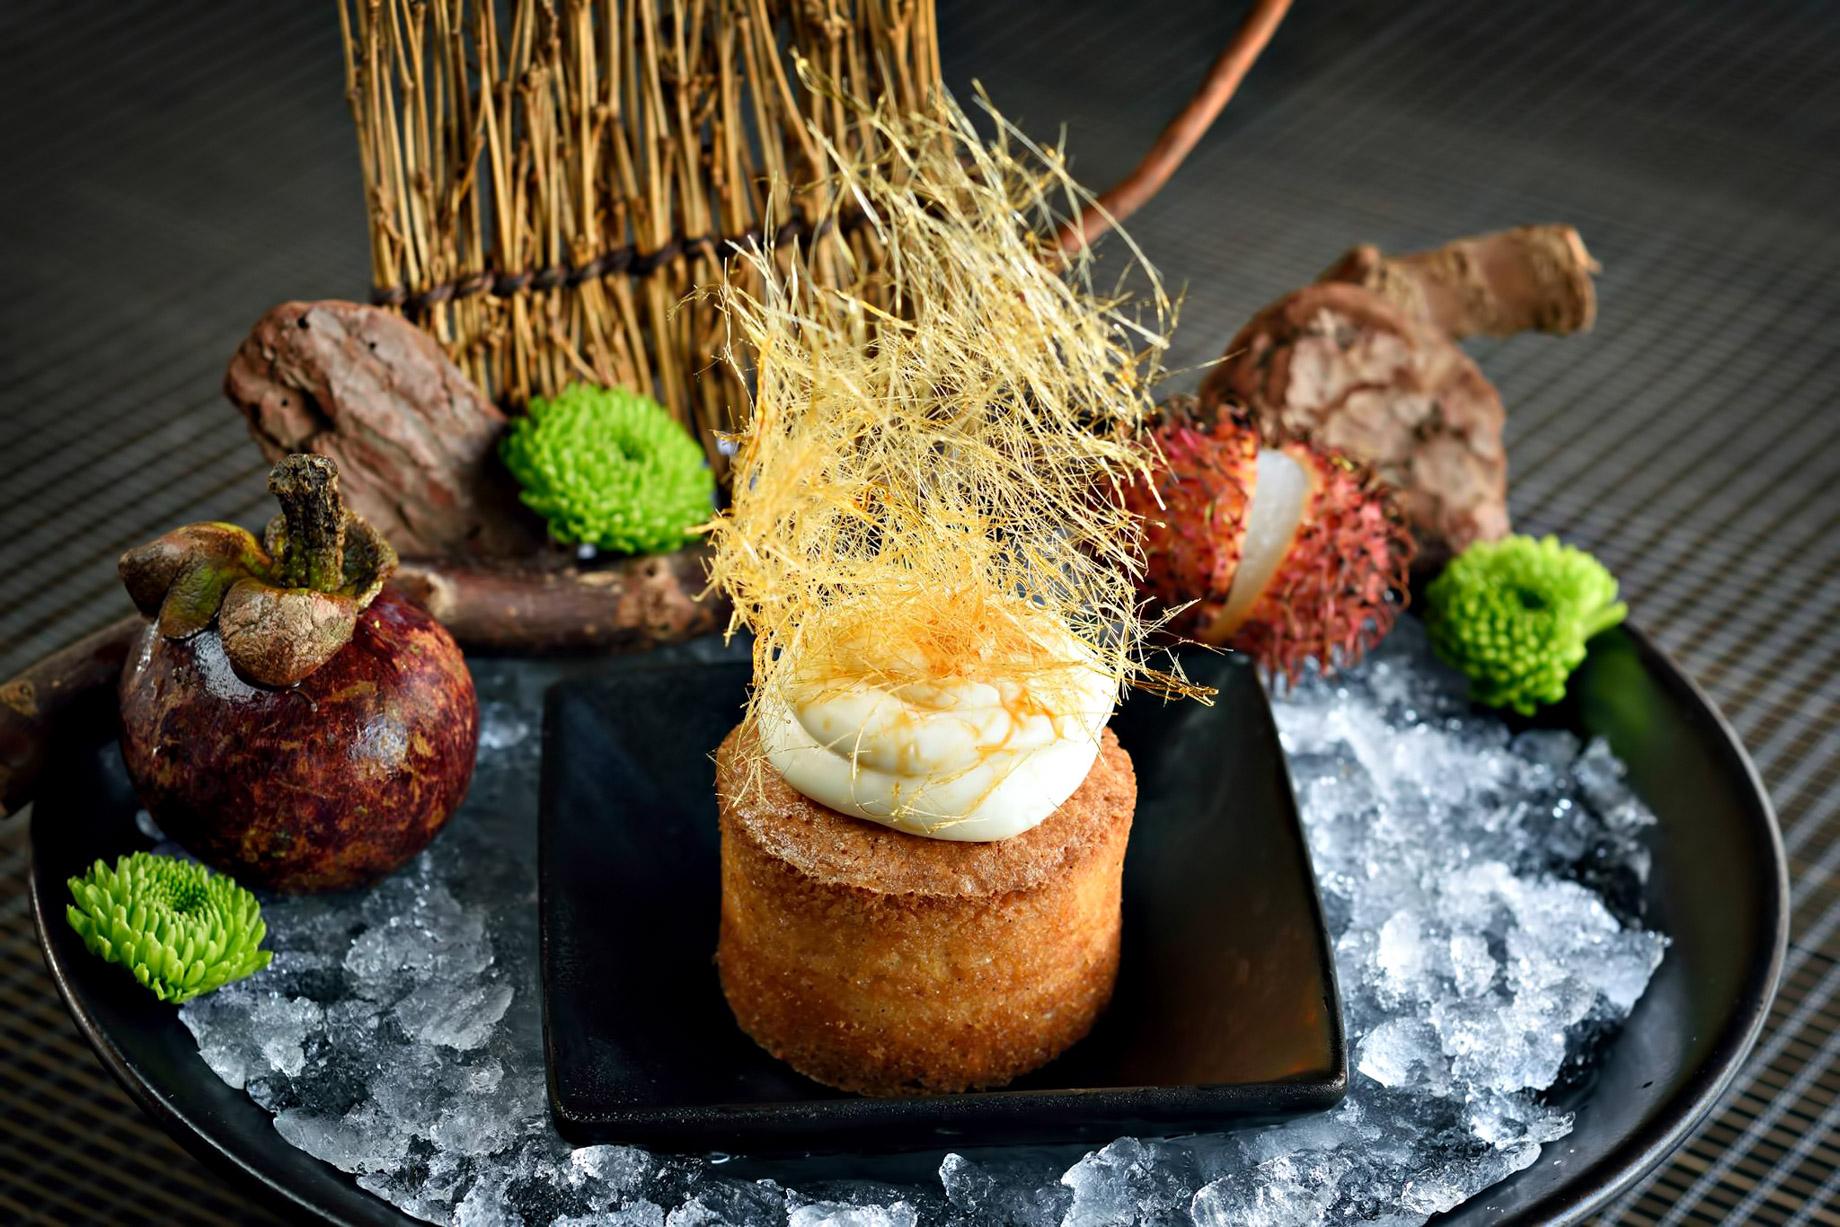 Armani Hotel Dubai – Burj Khalifa, Dubaï, Émirats arabes unis – art culinaire innovant Armani